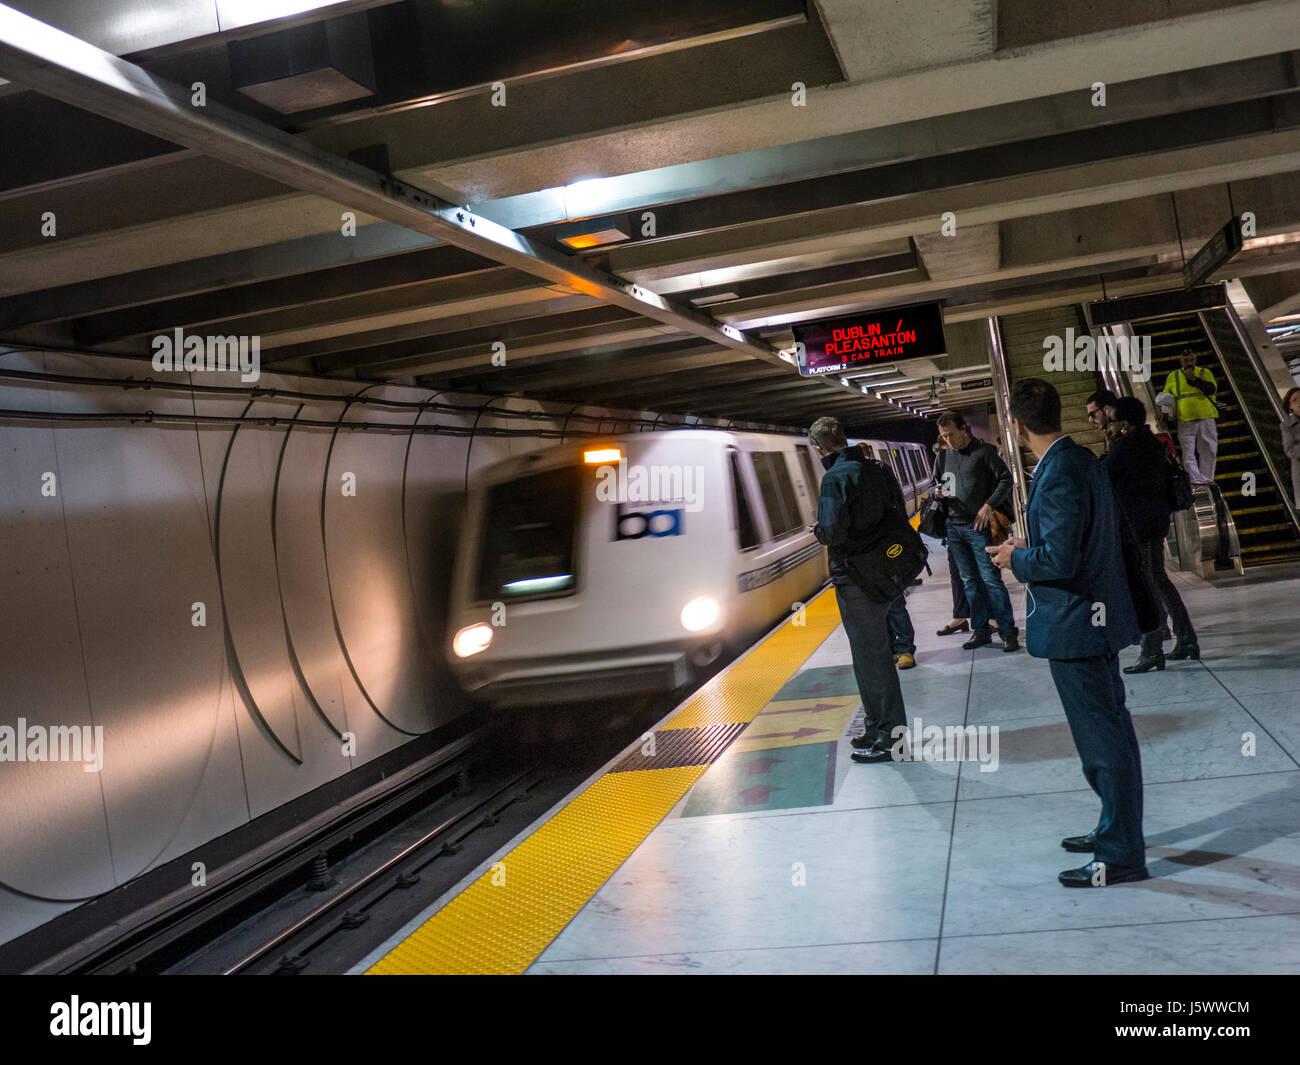 'Bart' (Bay Area Rapid Transit) train arriving underground at Market Street station San Francisco California - Stock Image